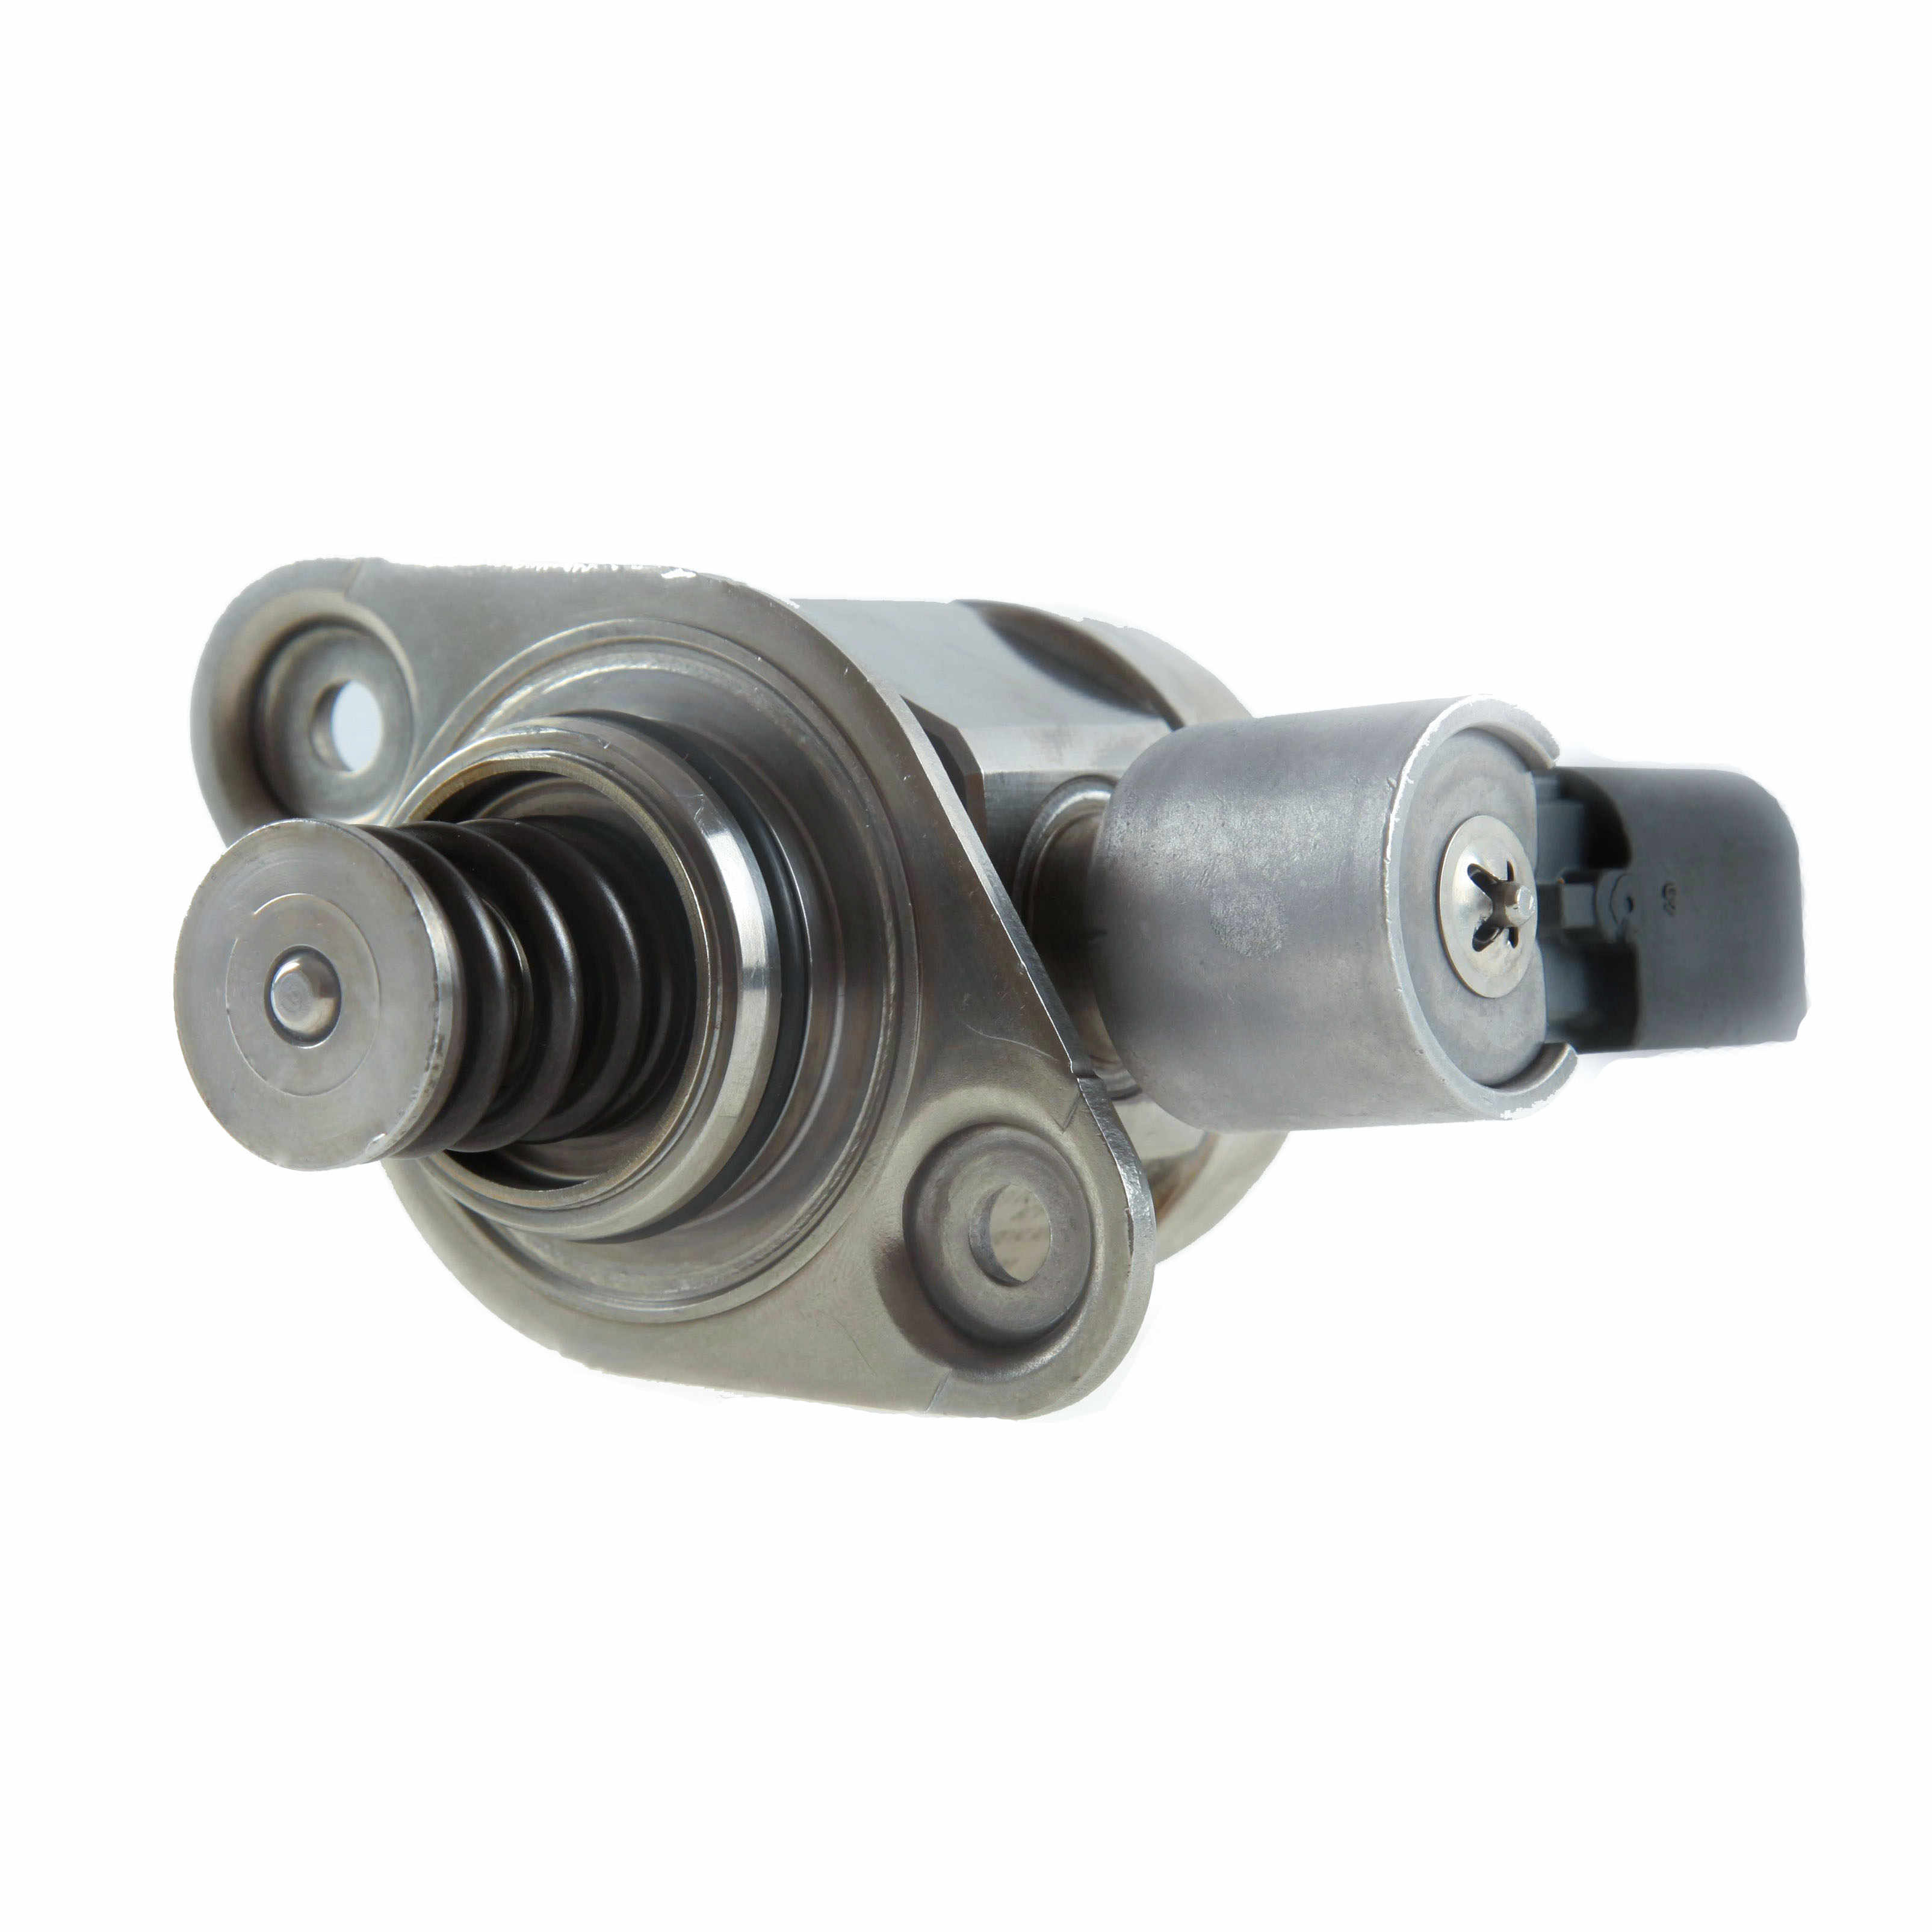 OEM 06H127025Q 06H127025K مضخة عالية الضغط مضخة الوقود لشركة فولكس فاجن جولف جيتا MK6 باسات B6 تيغوان أودي A4 TT مقعد 1.8TFSI 2.0TFSI